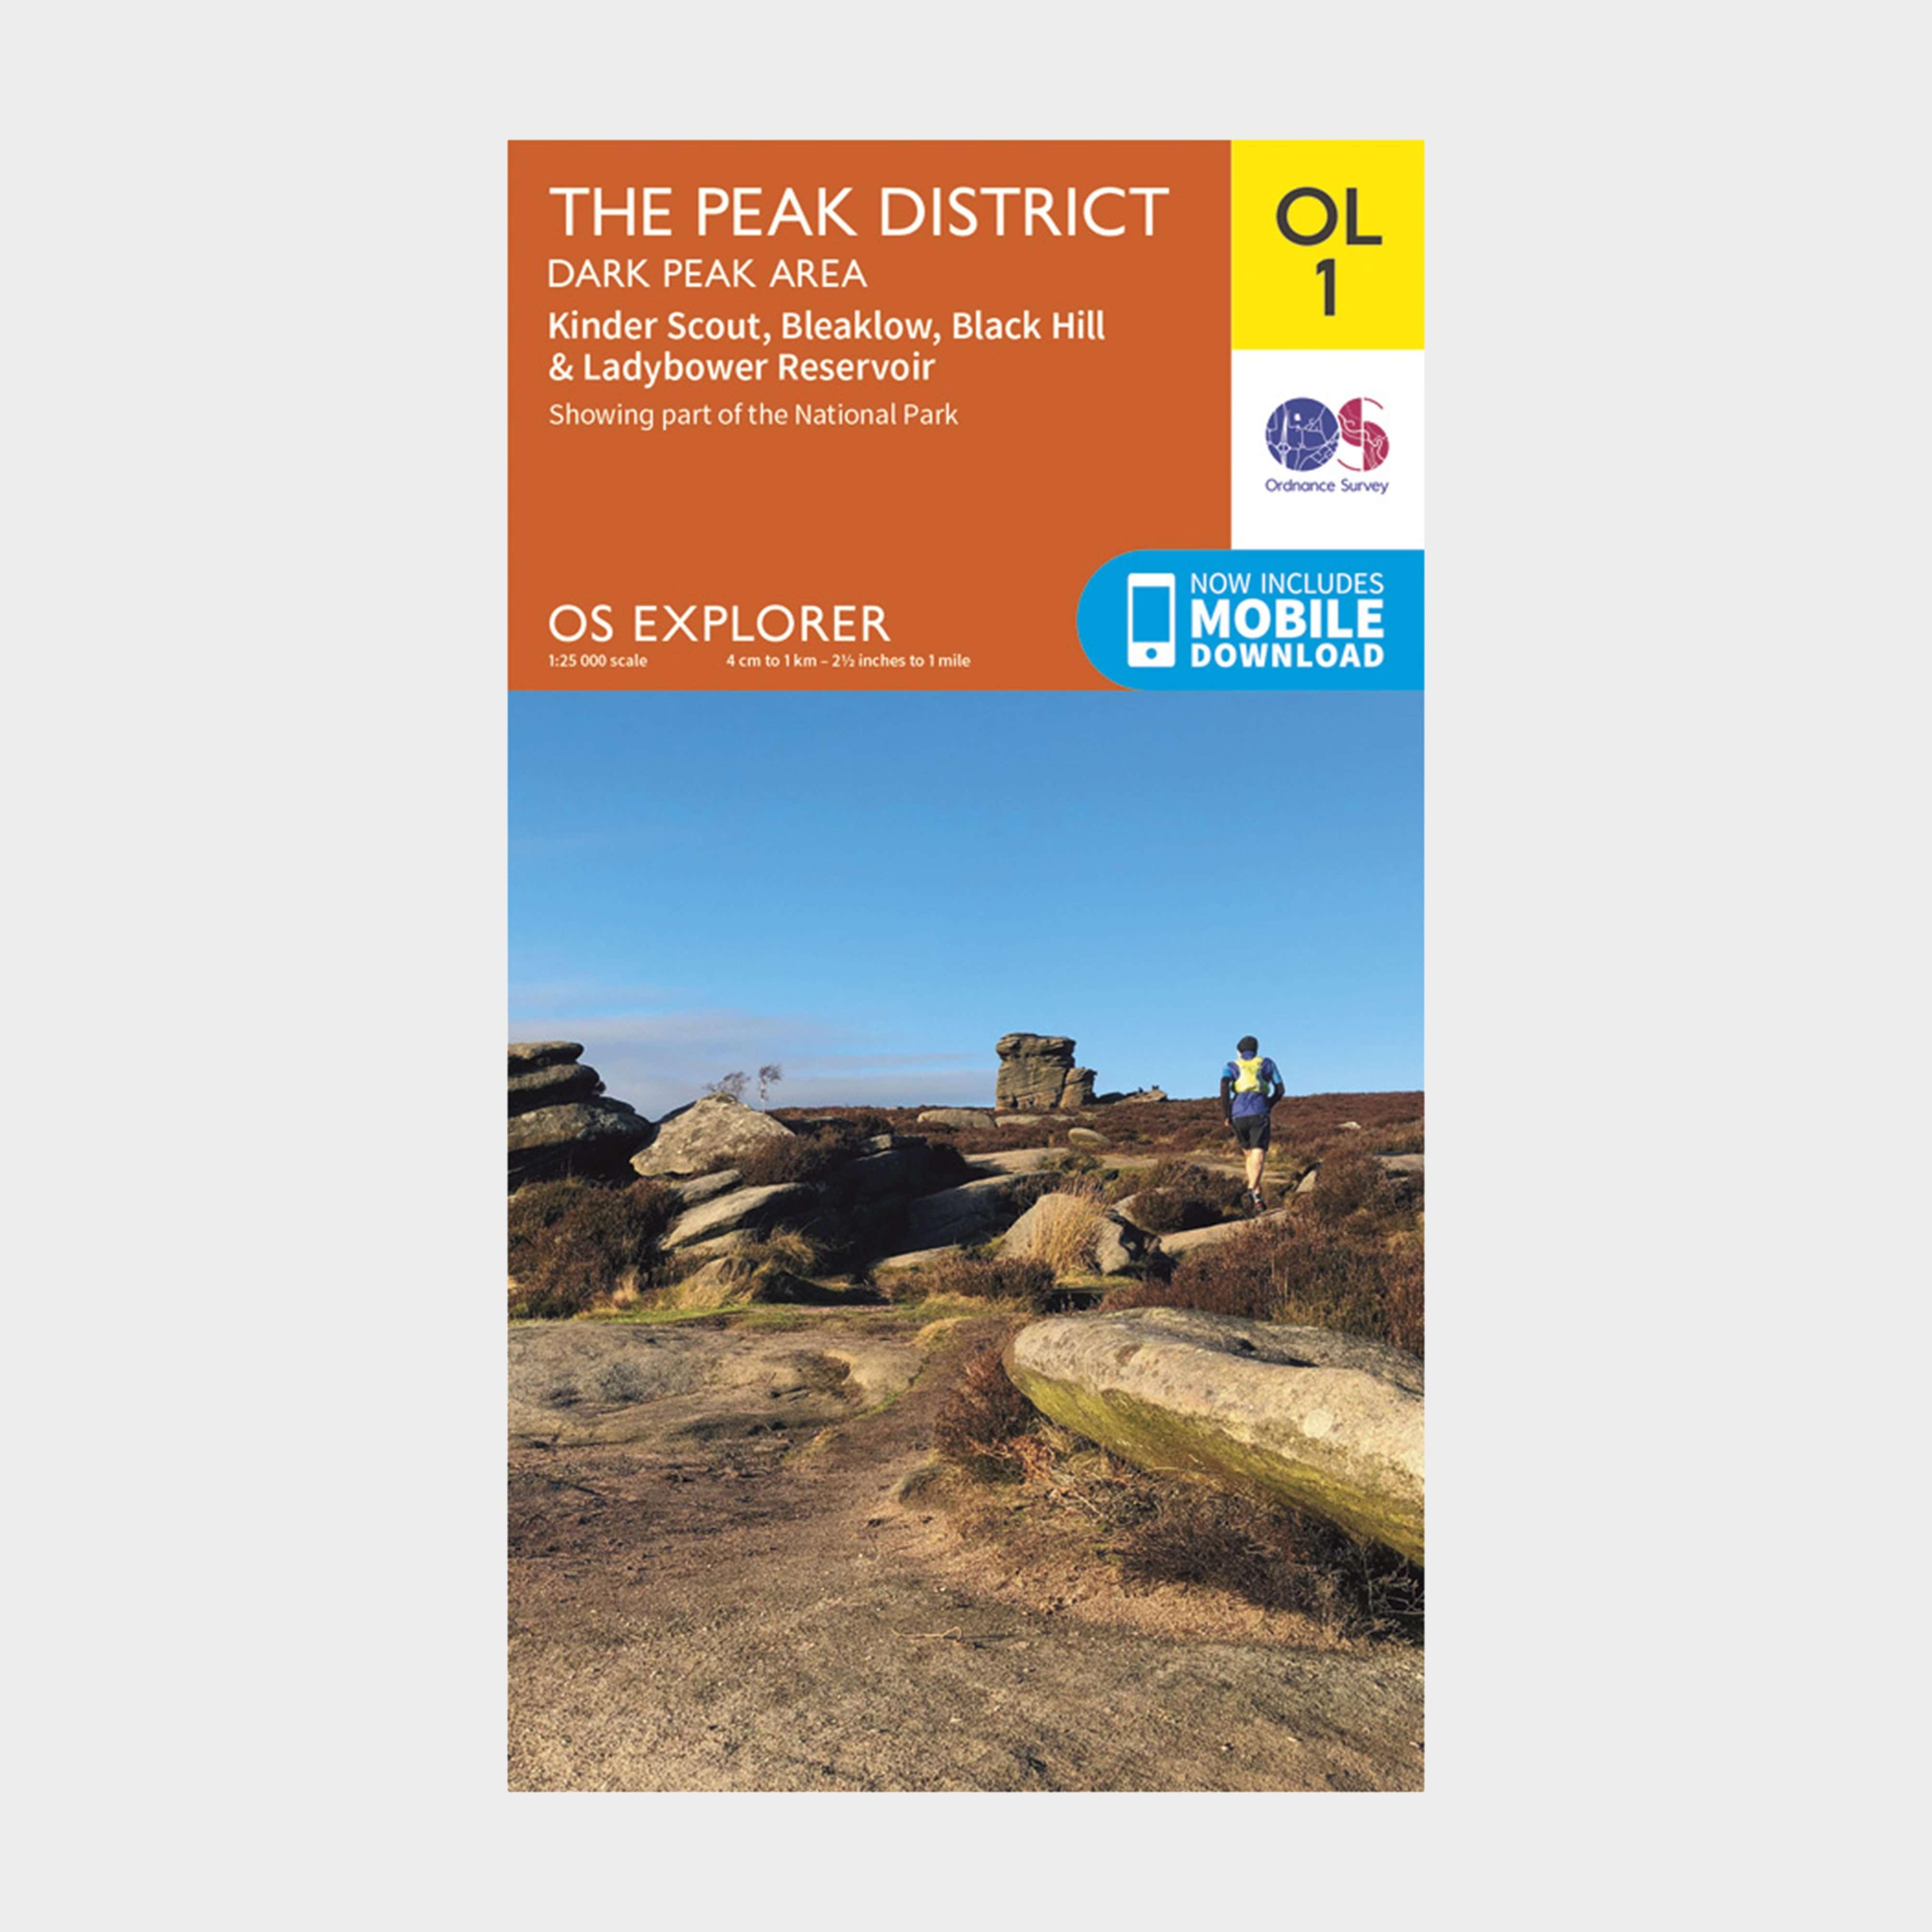 ORDNANCE SURVEY Explorer OL 1 The Peak District - Dark Peak Area